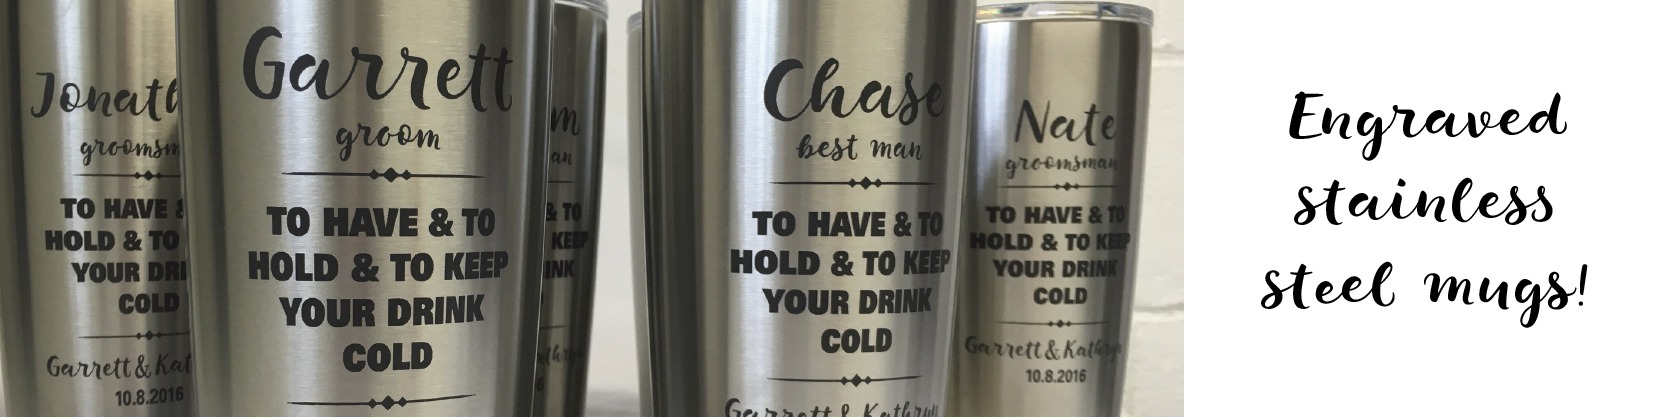 Engraved stainless steel mugs